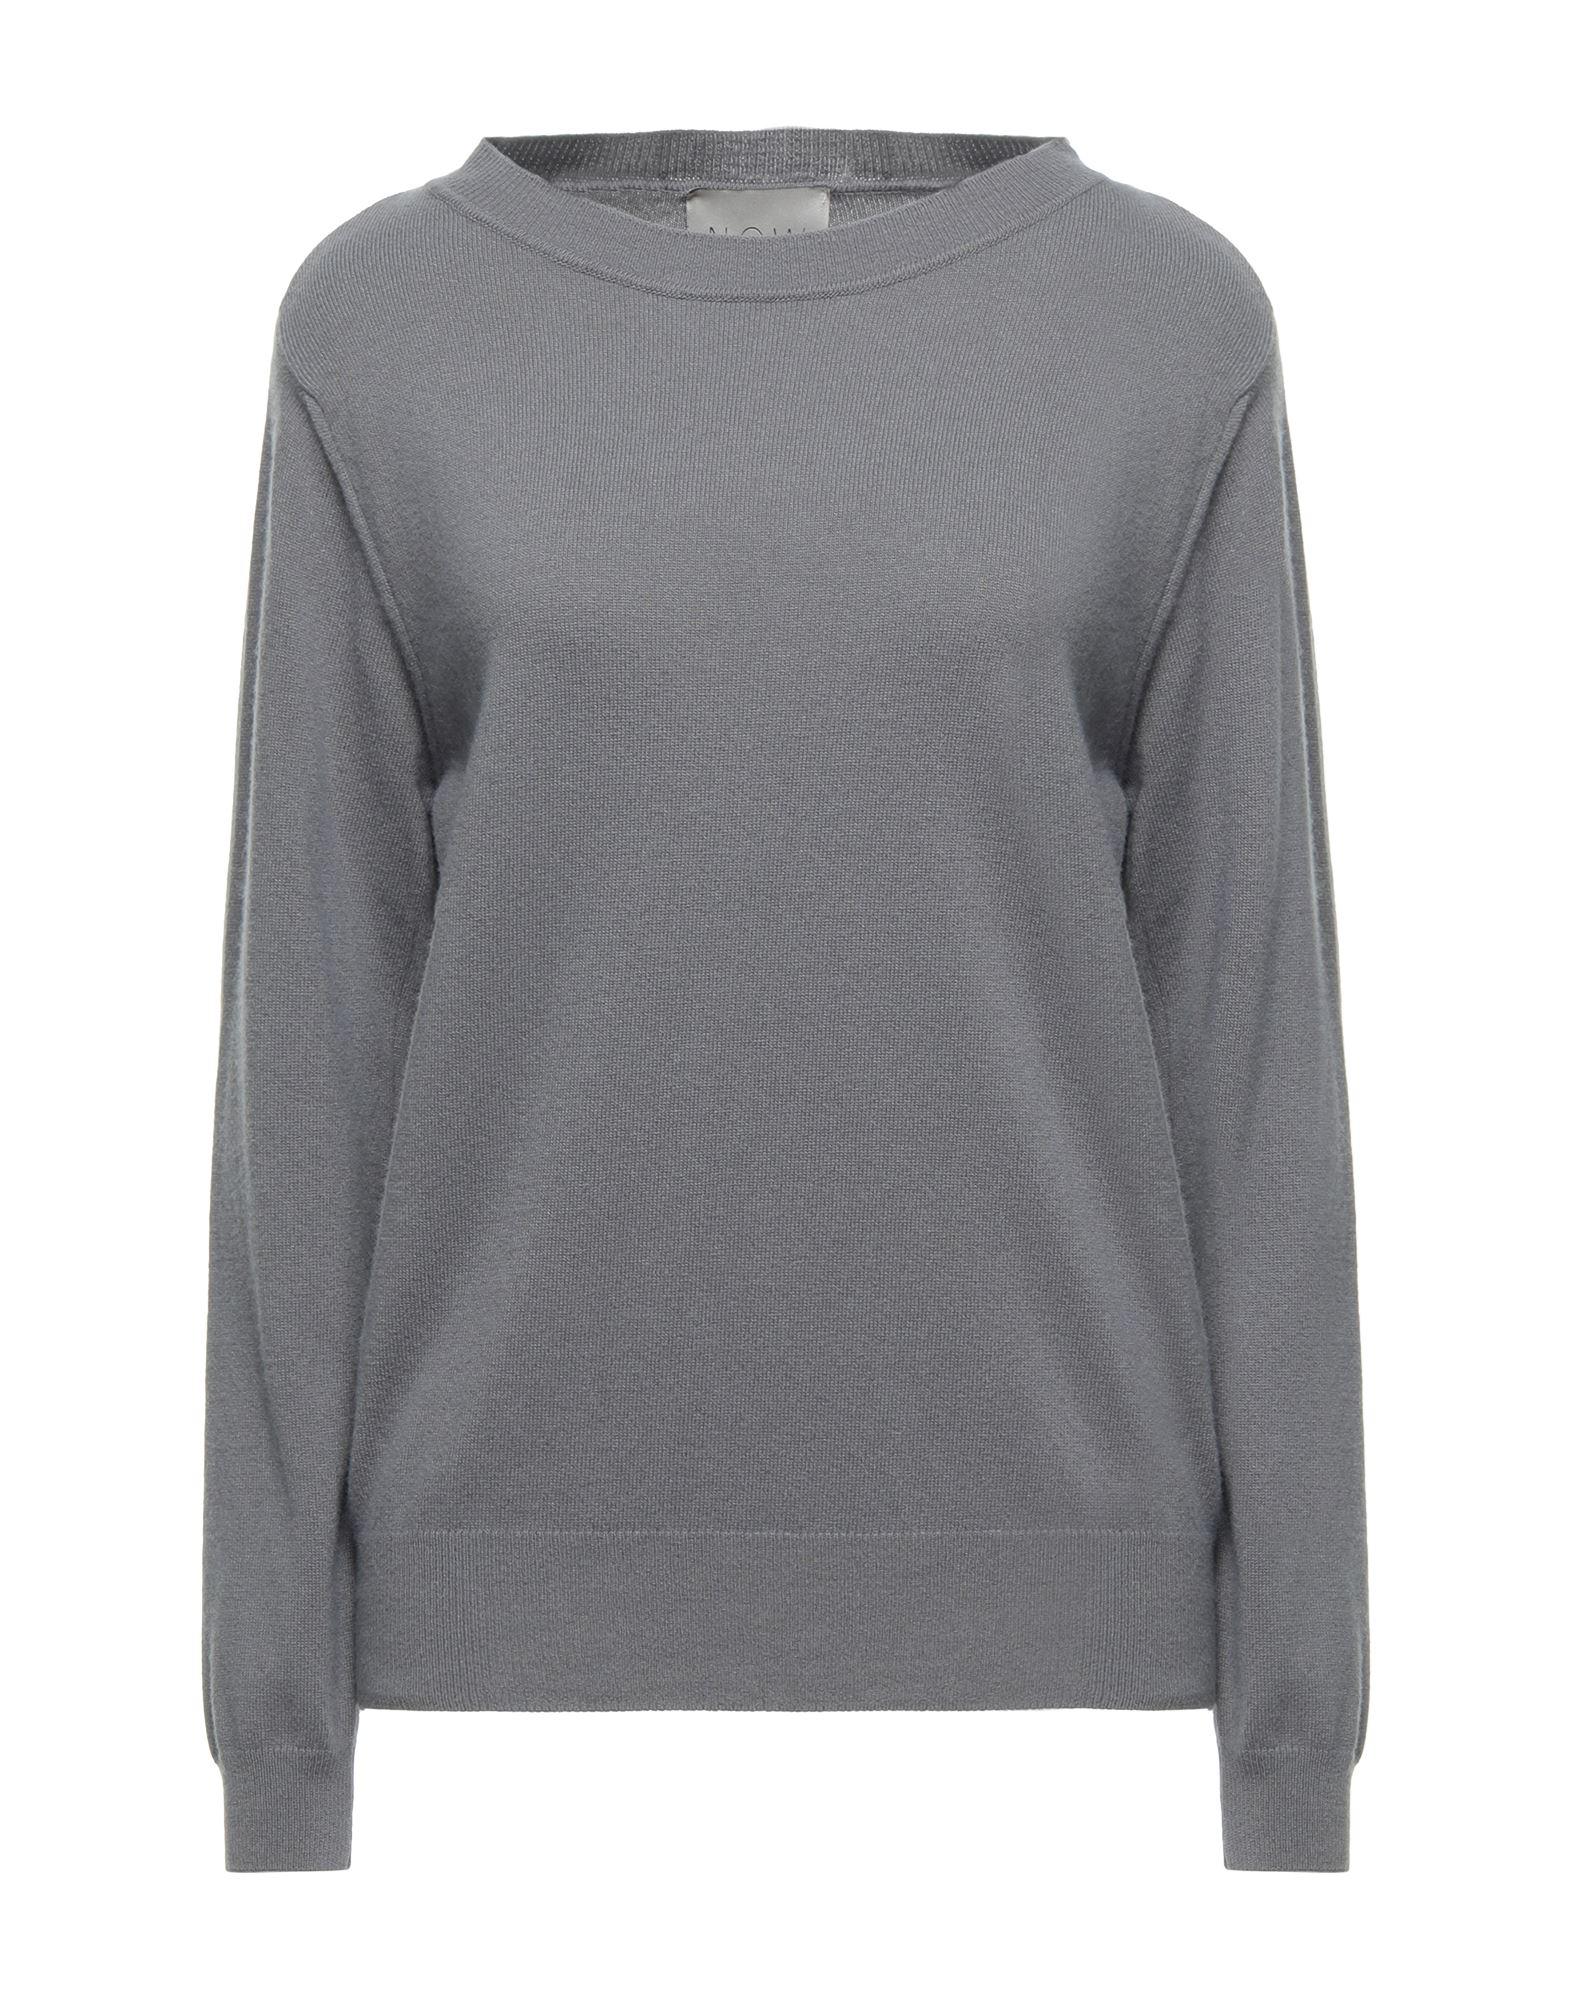 N.O.W. ANDREA ROSATI CASHMERE Sweaters - Item 14130379